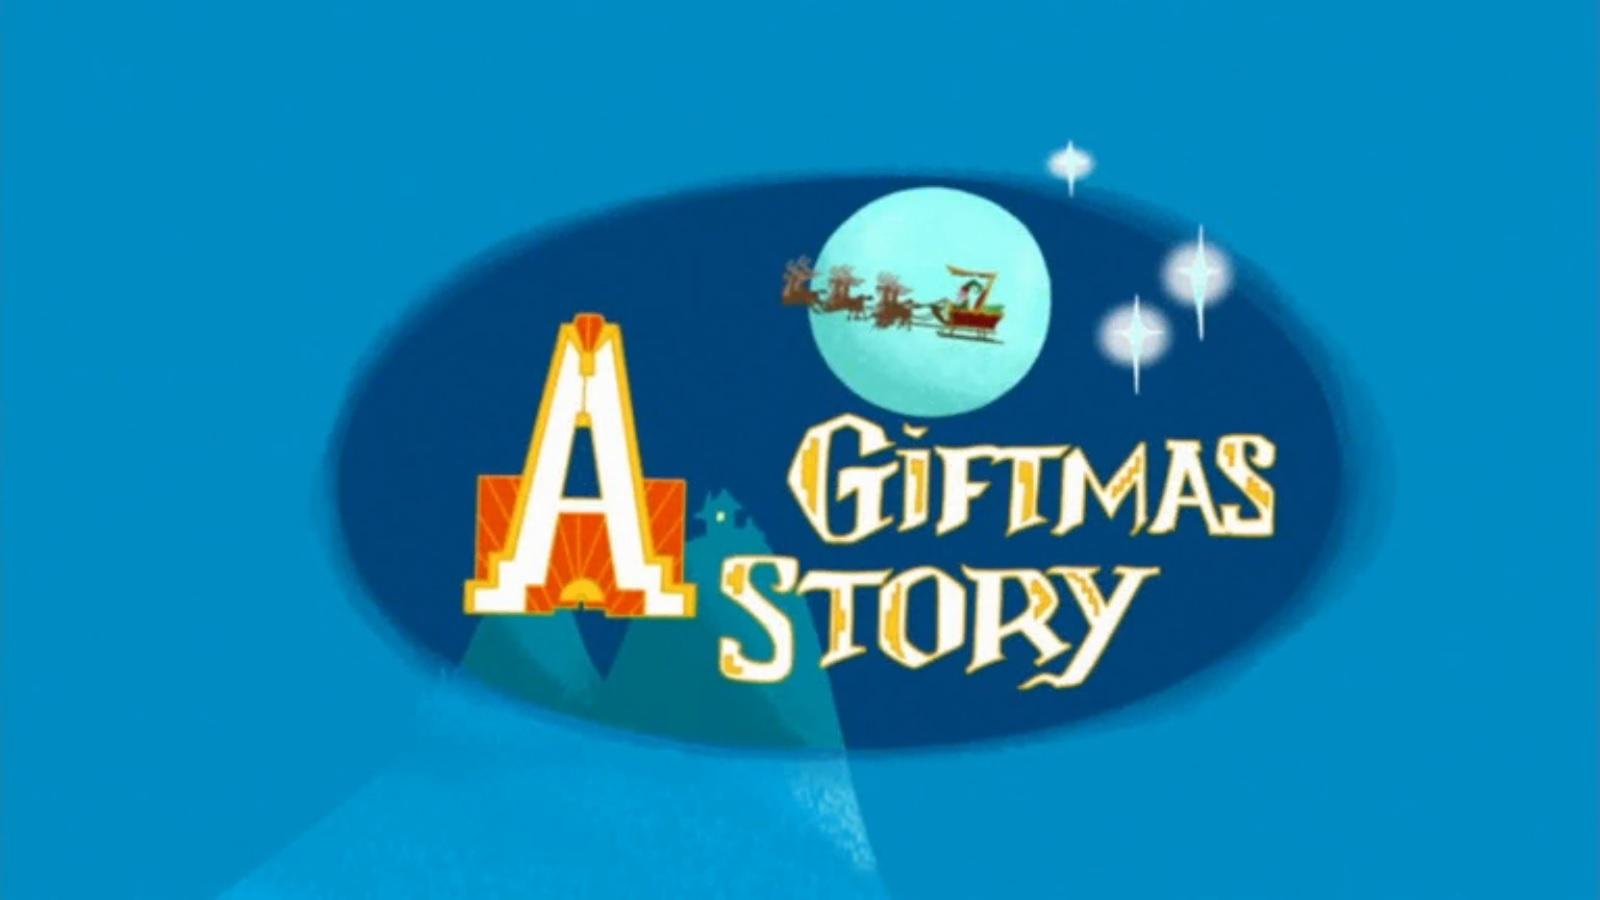 A Giftmas Story